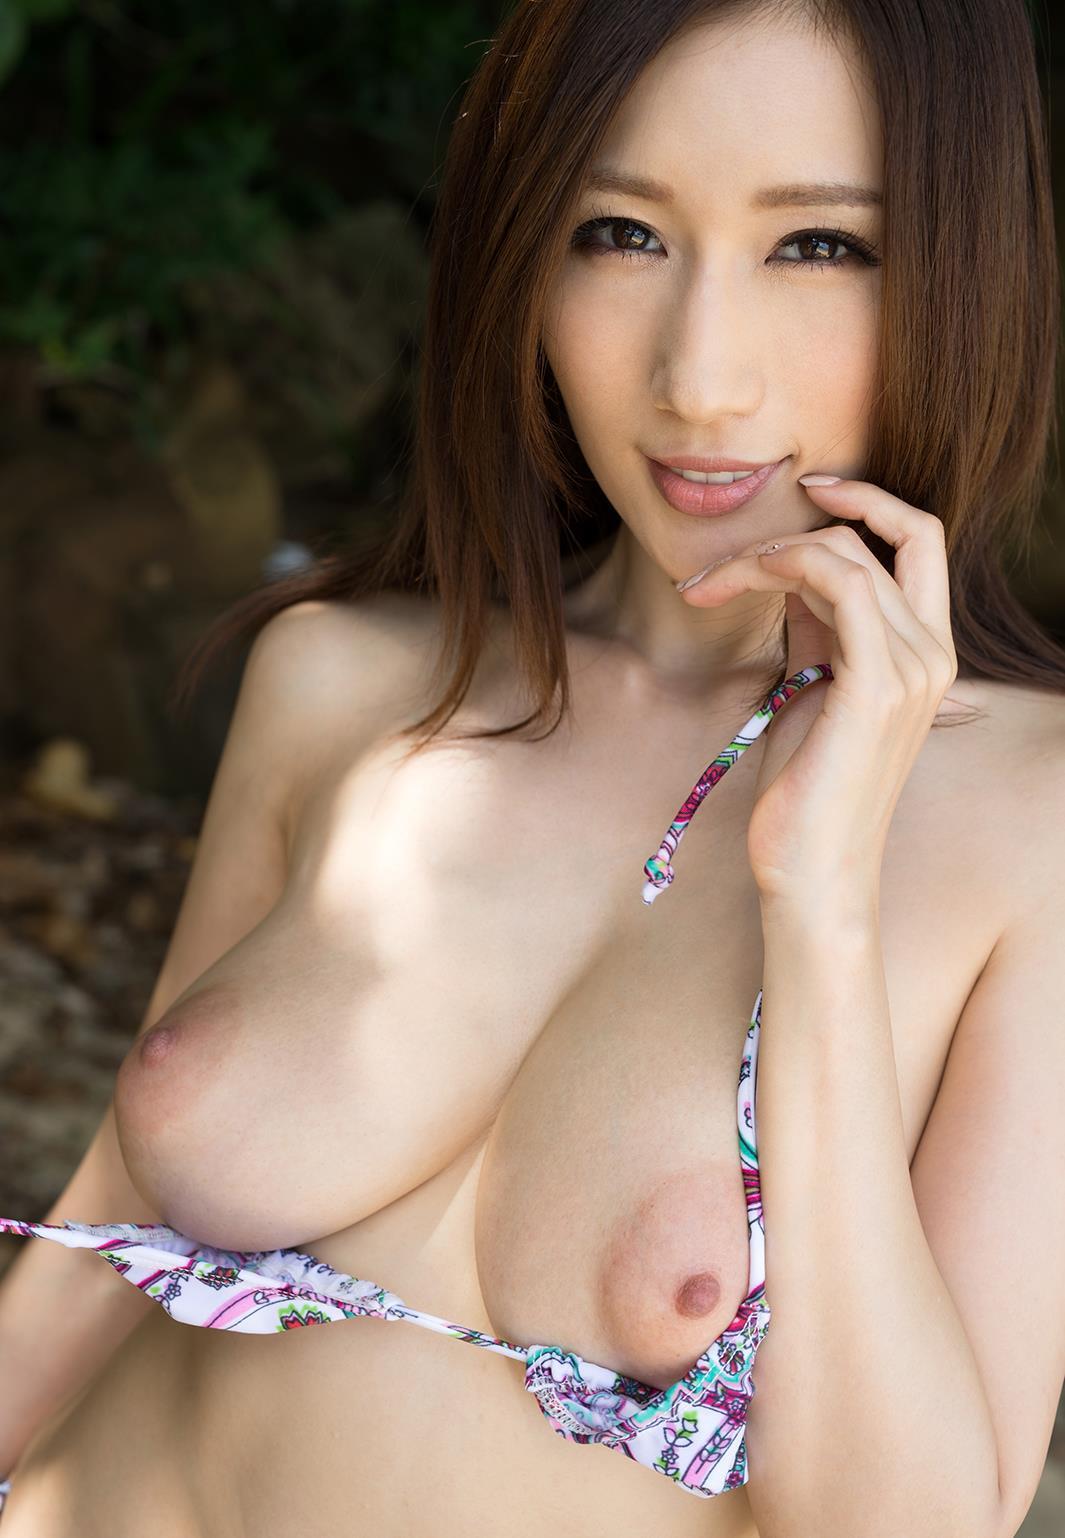 AV女優・JULIA(ジュリア) ヌード画像 50